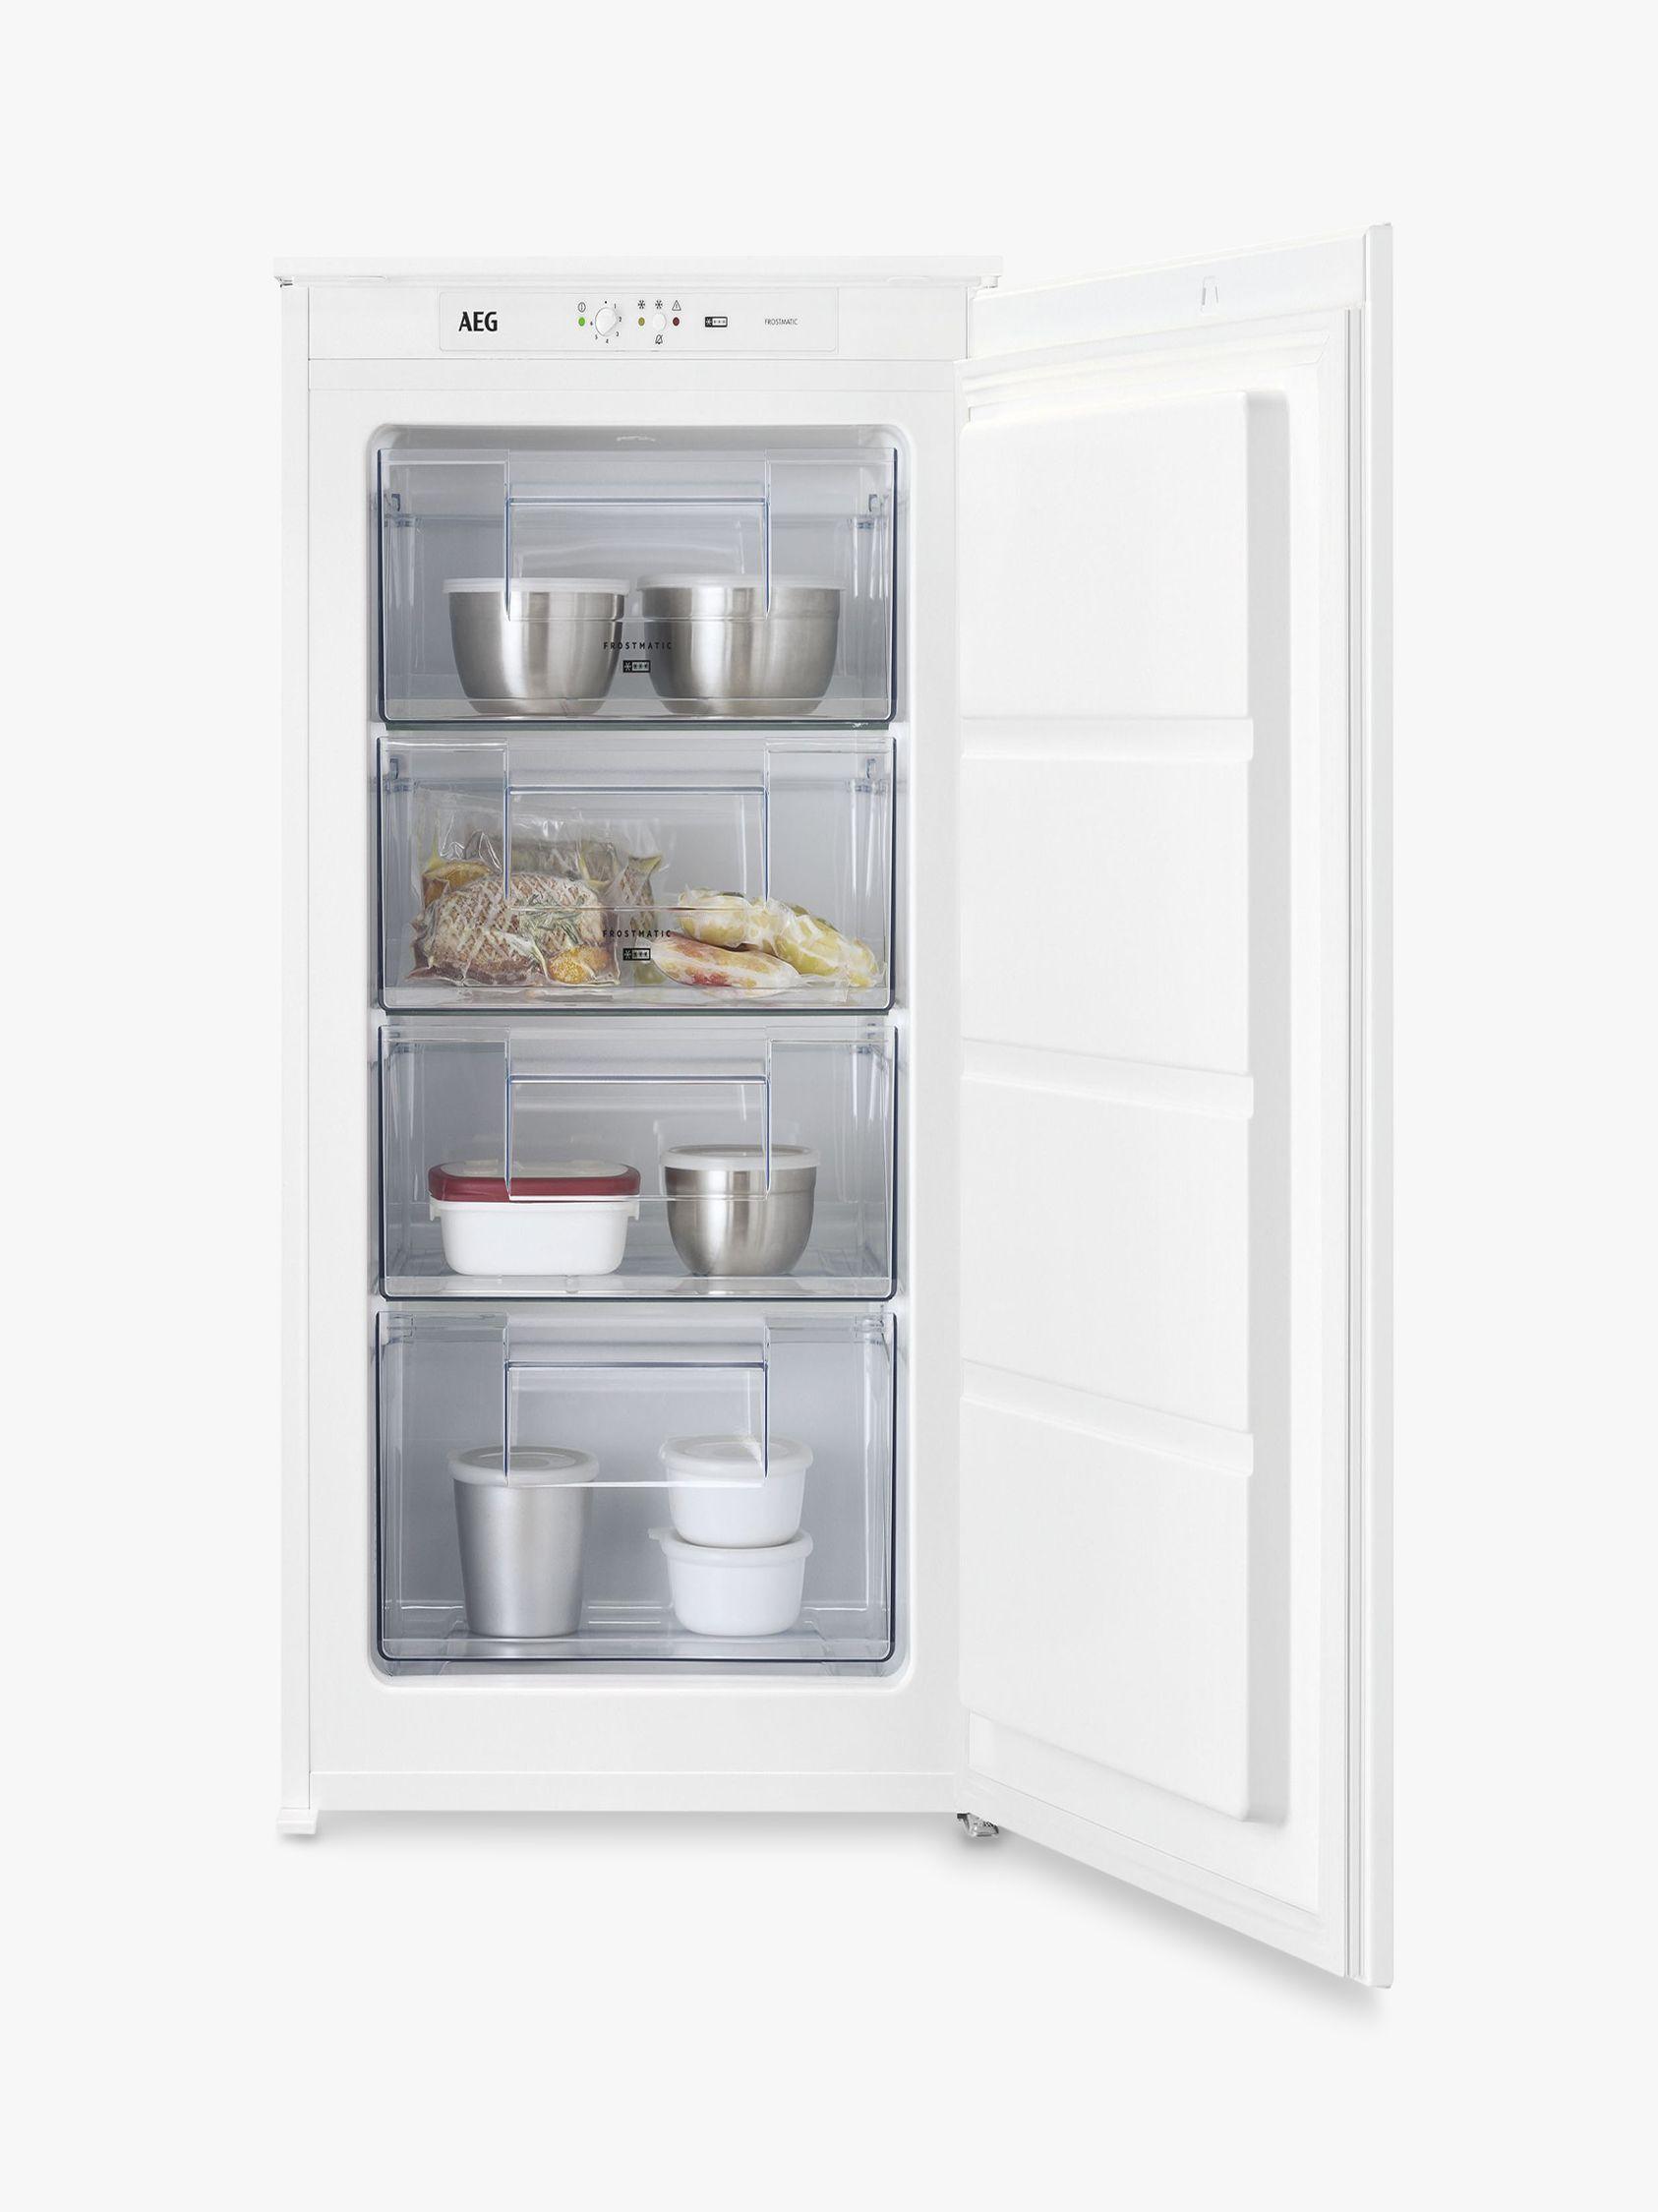 AEG AEG ABE6882VLS Integrated Freezer, A+ Energy Rating, 54cm Wide, White